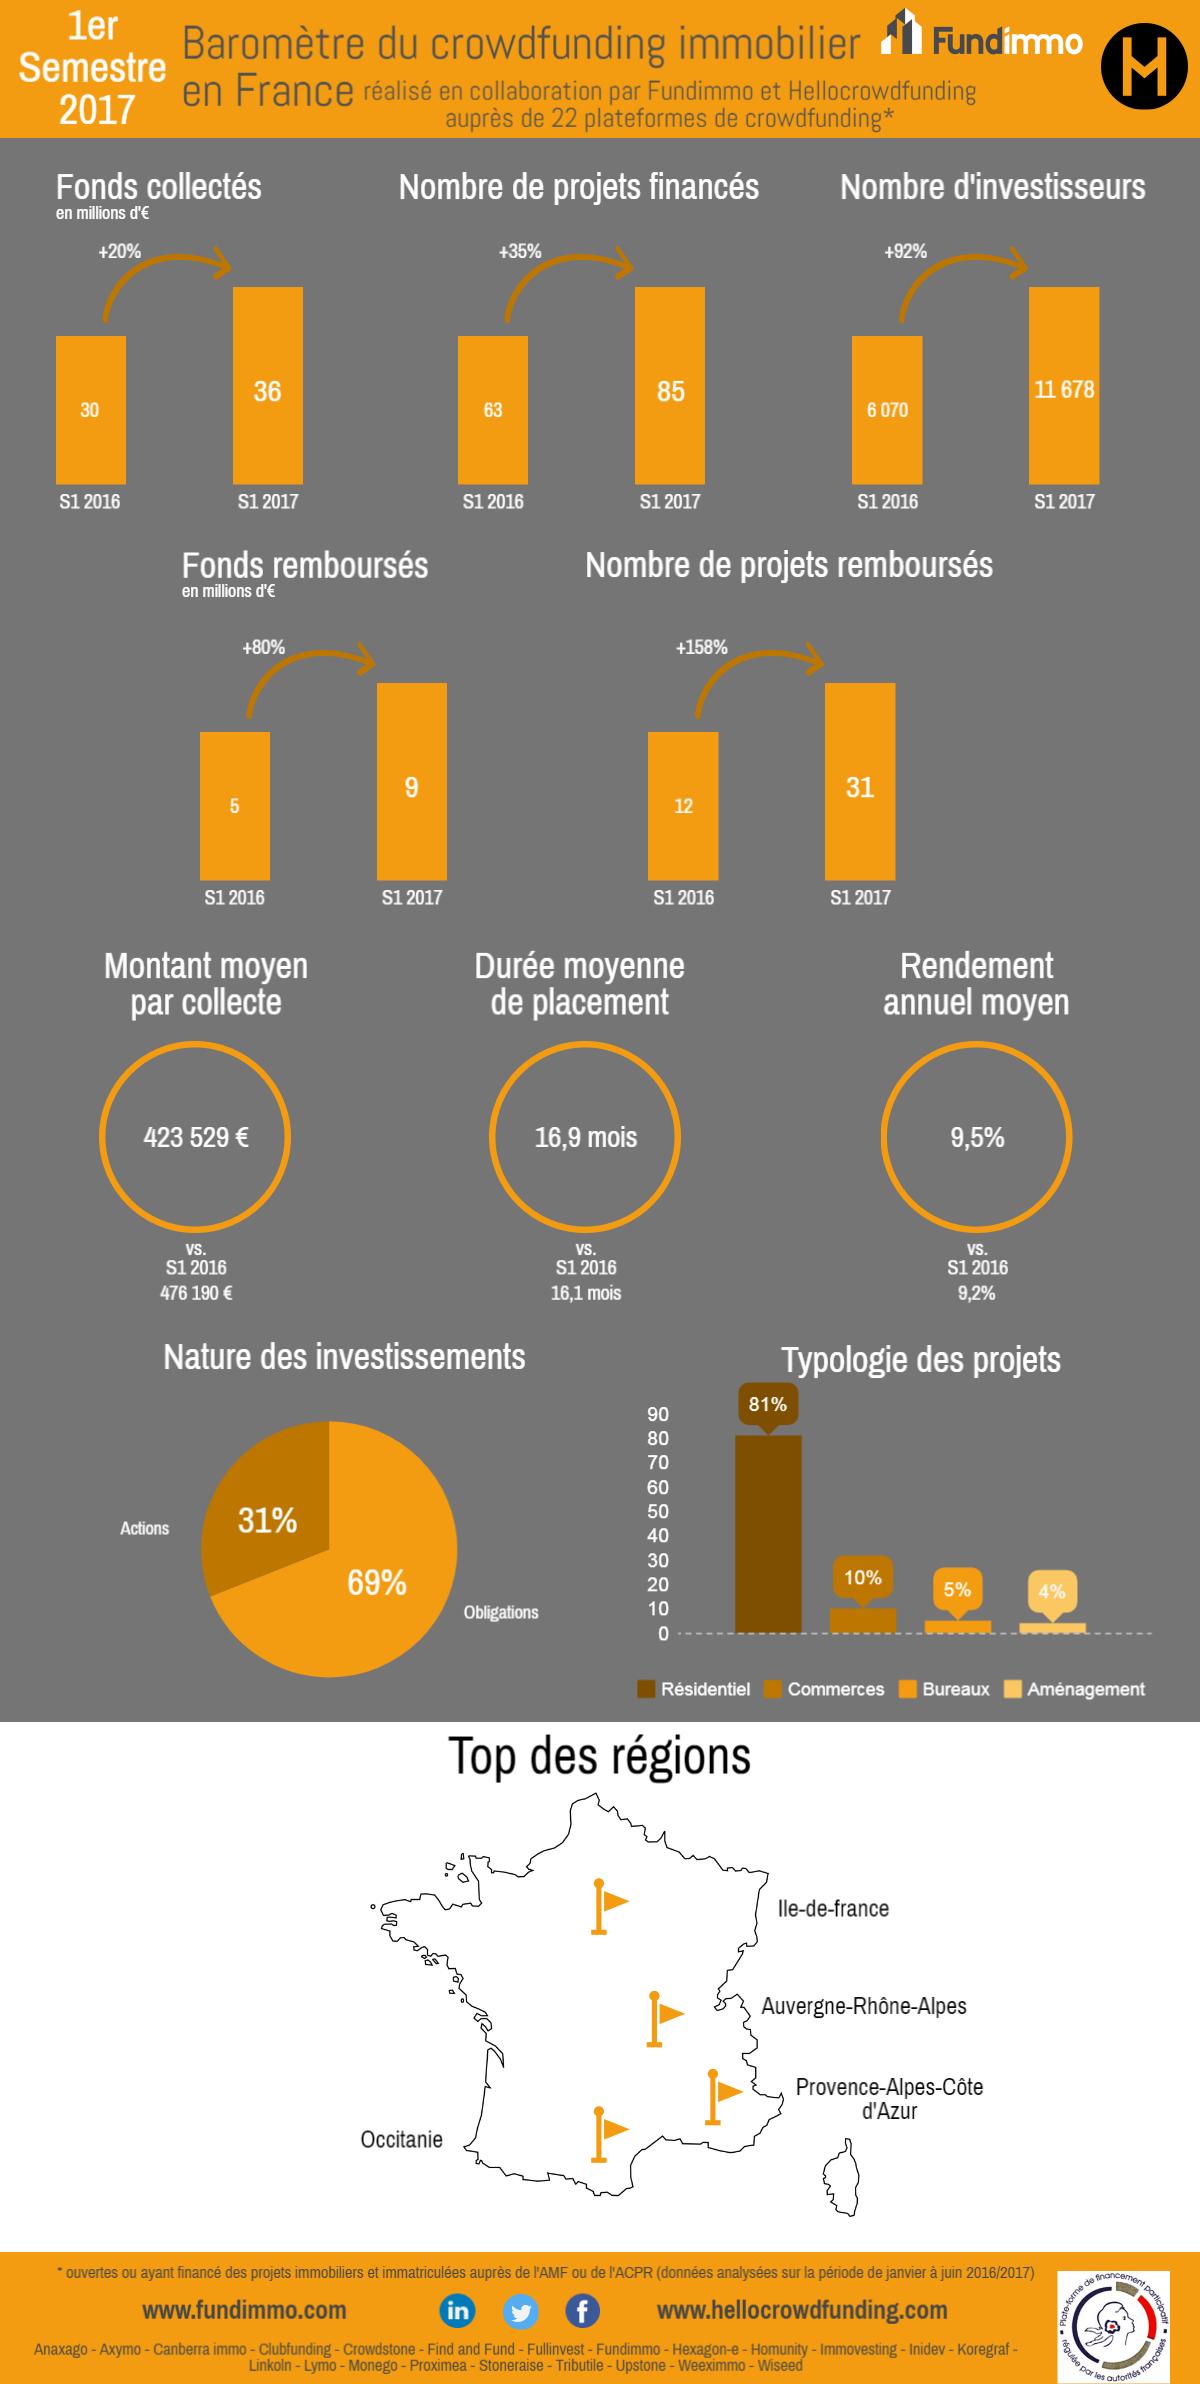 Baromètre du Crowdfunding immobilier en France